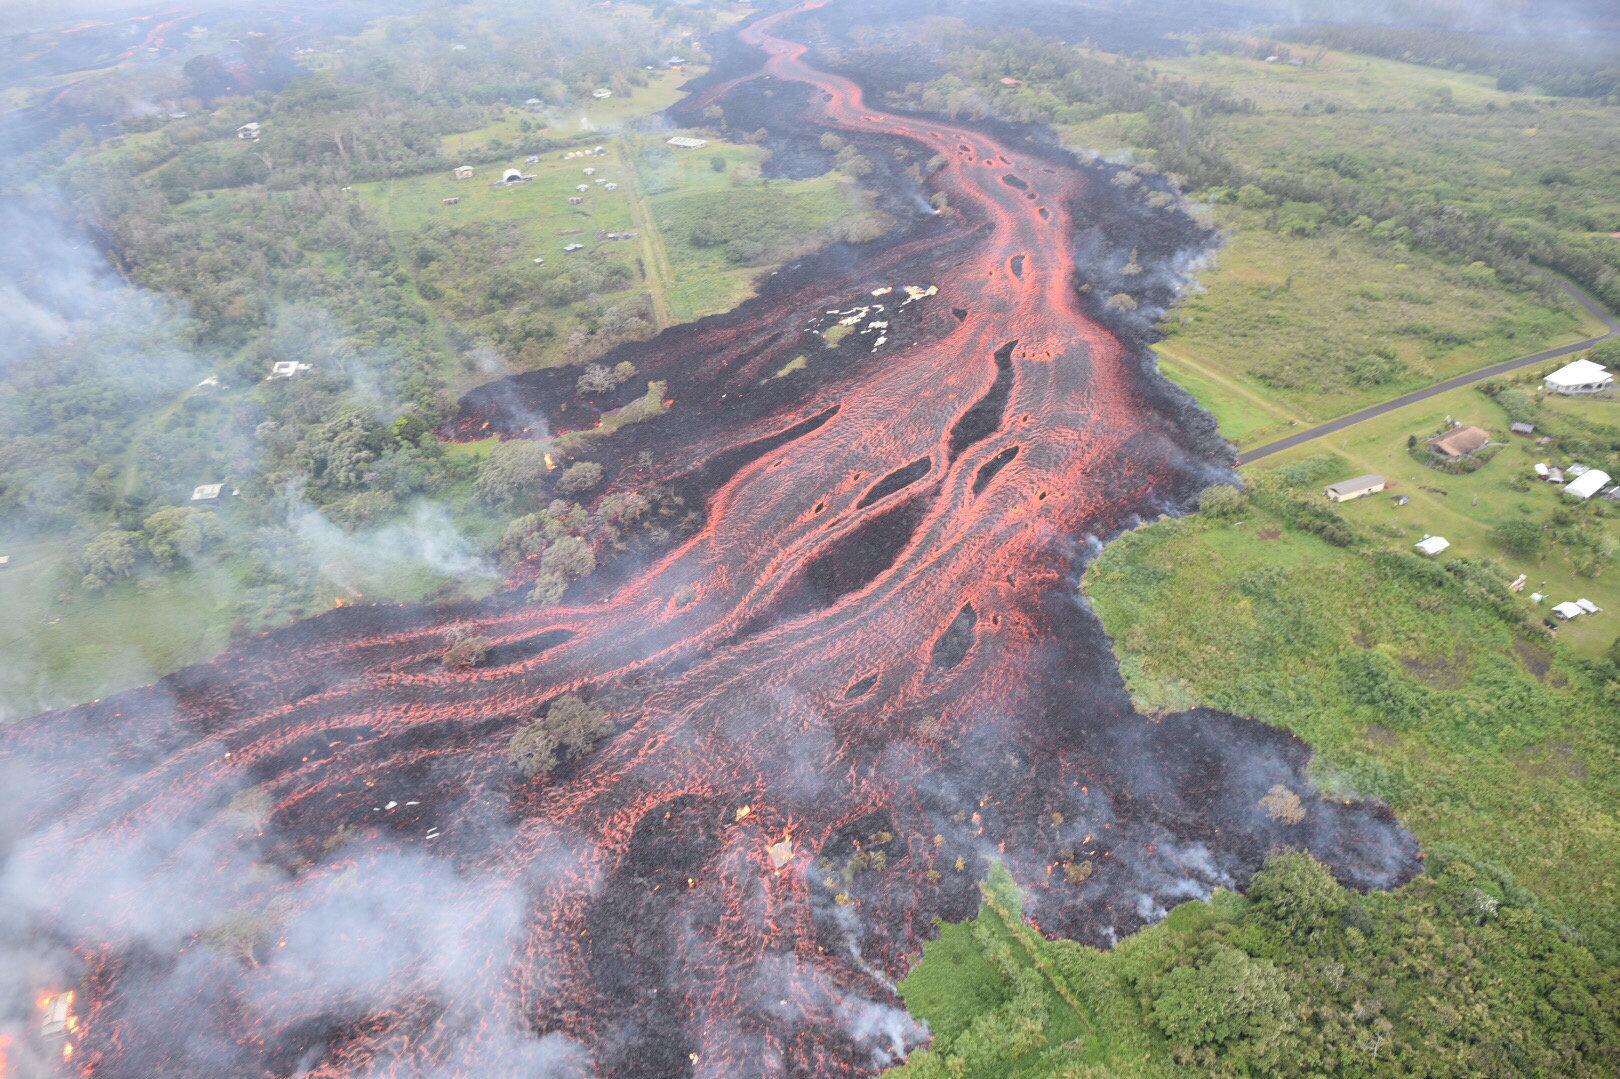 La lave du volcan Kilauea